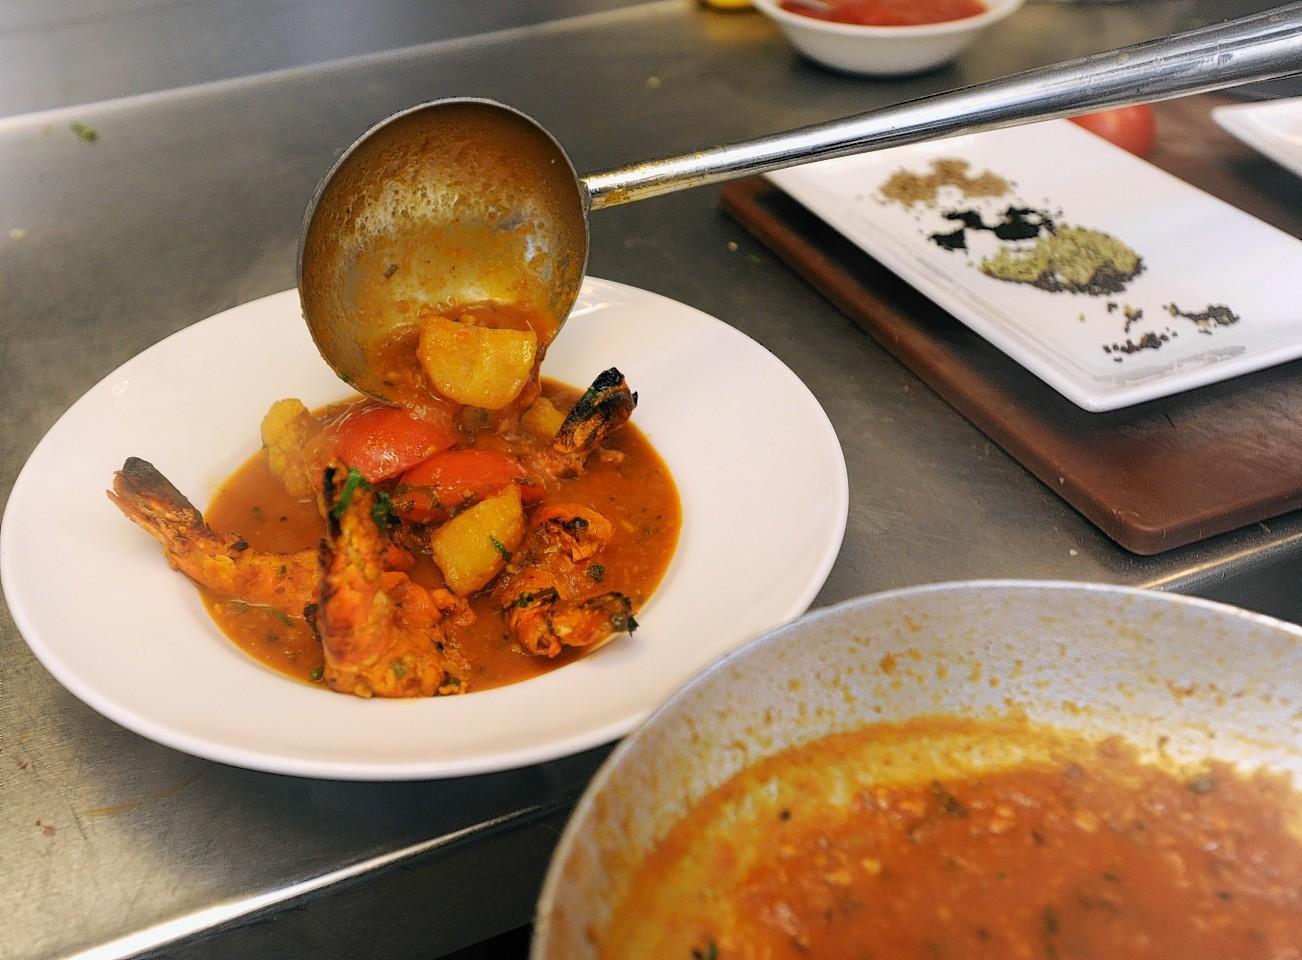 Curry at Shri Bheema in Aberdeen